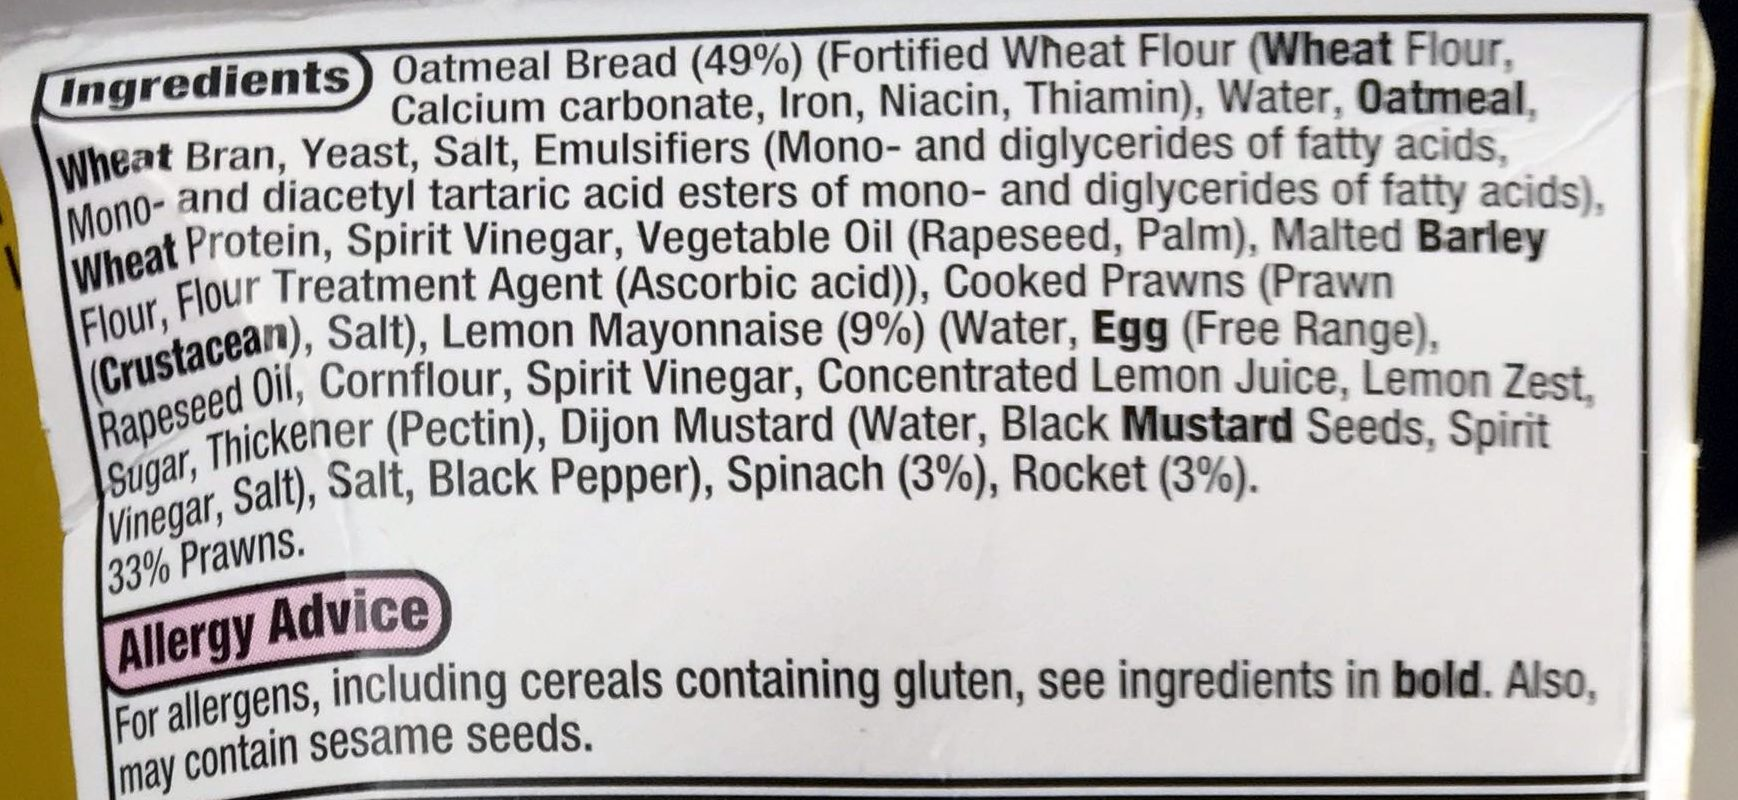 low fat prawn & rocket - Ingredients - en